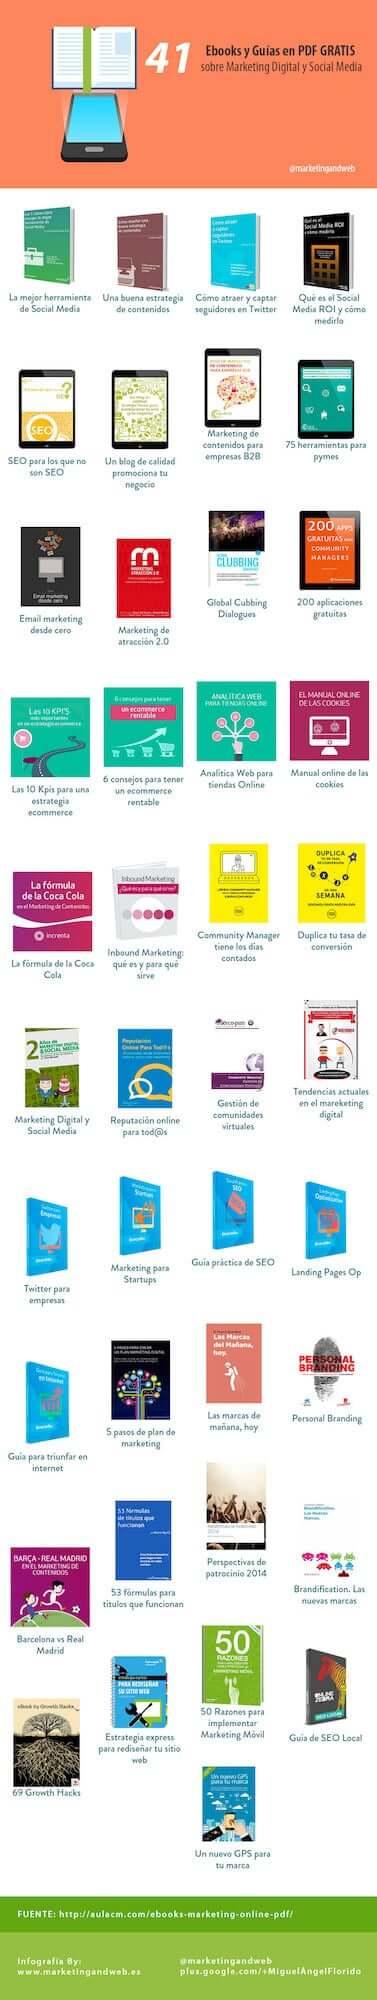 ebooks gratis marketing digital social media infografia